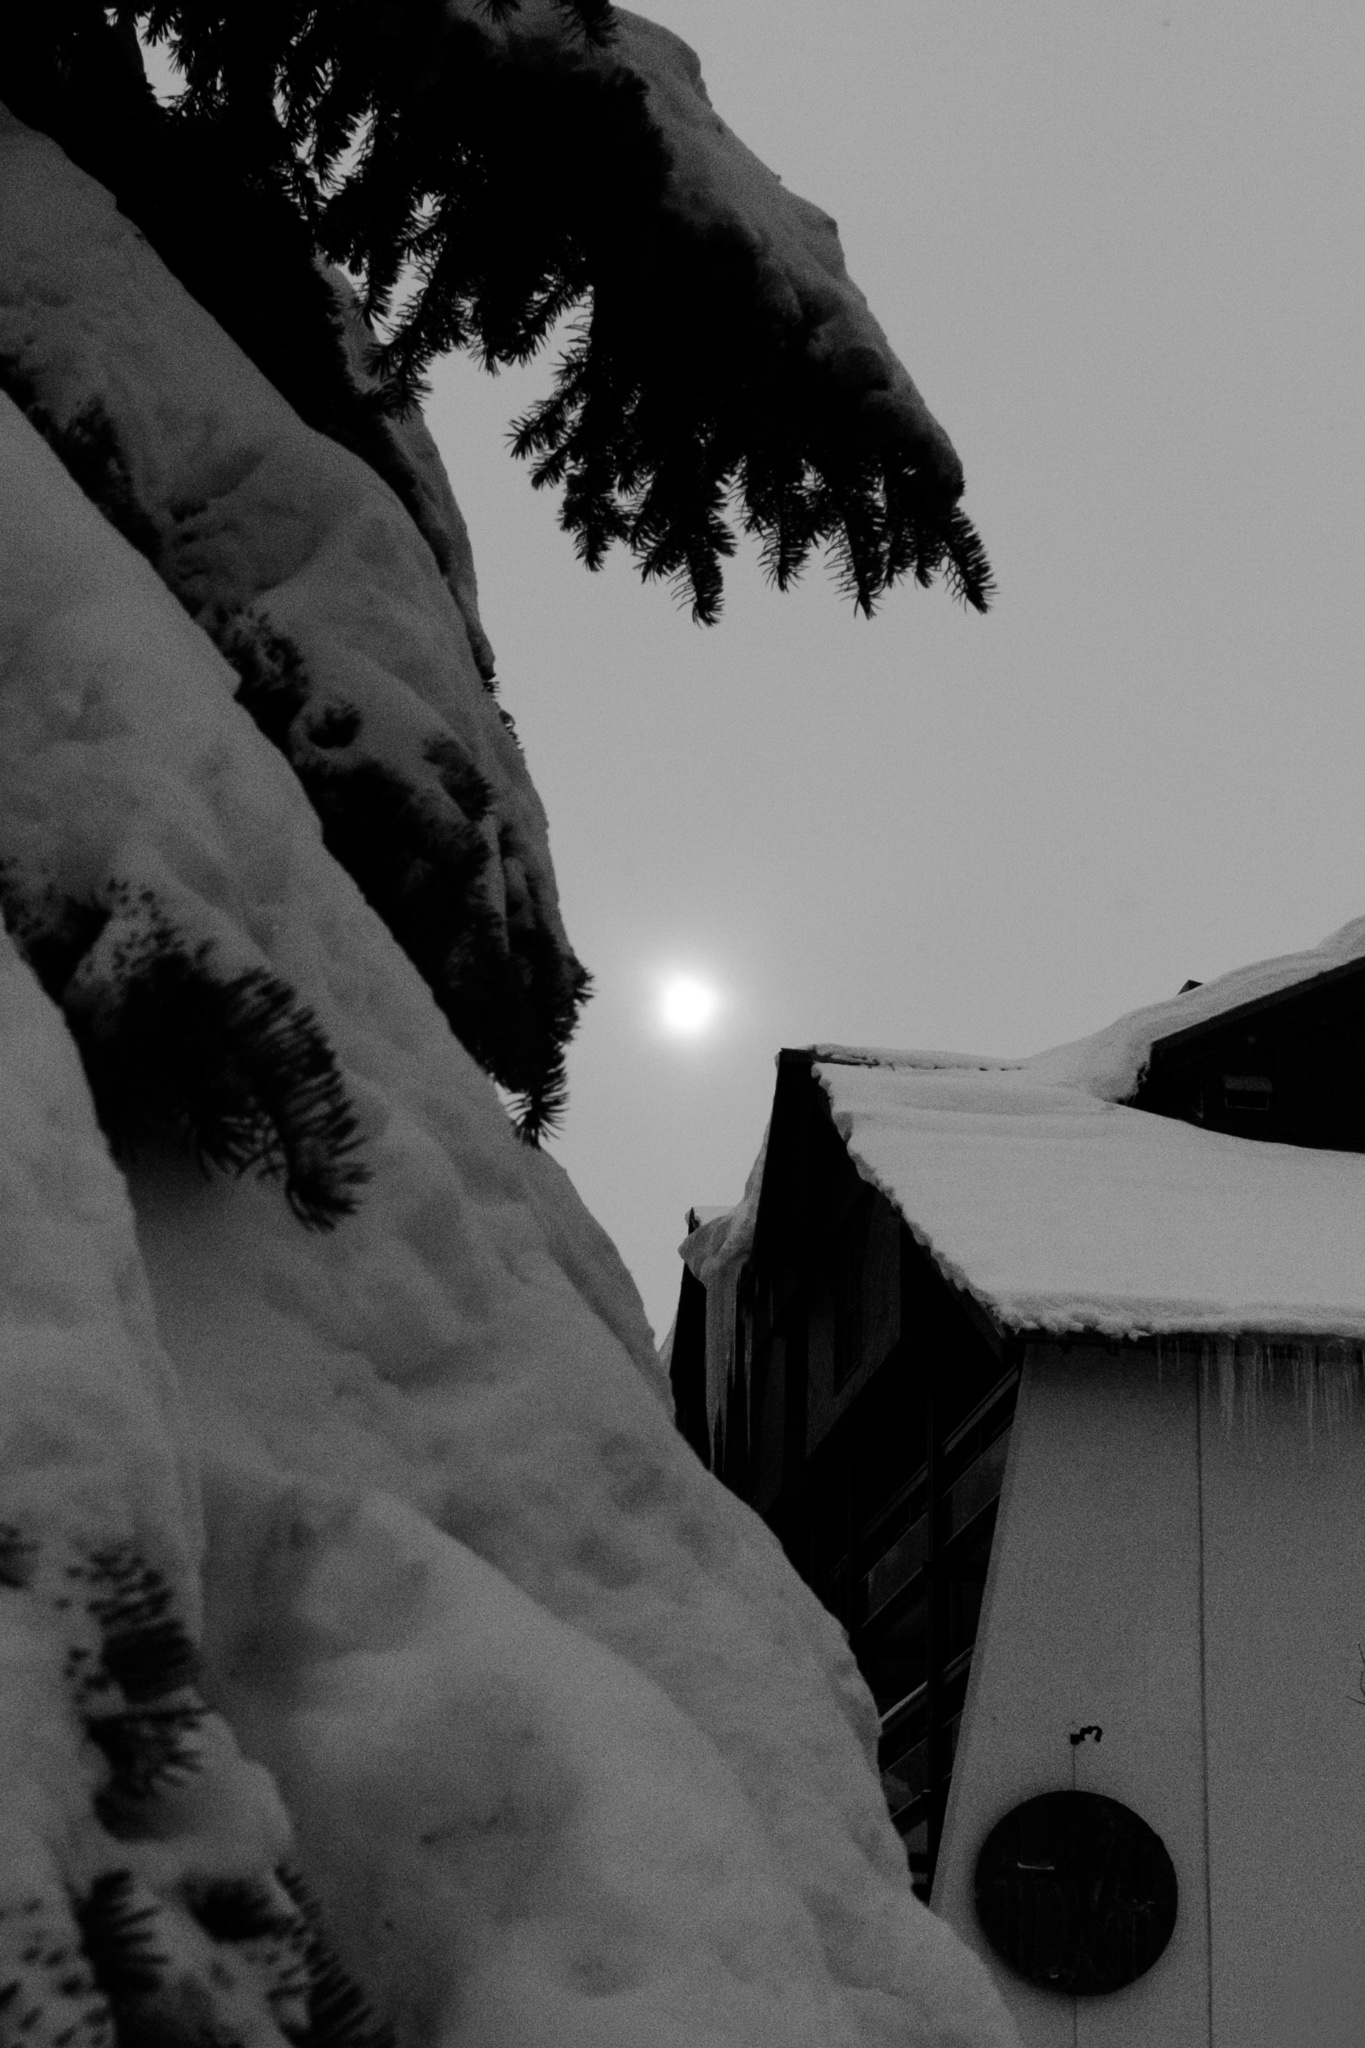 1923-savoie-snow-covered-ski-resort.jpg